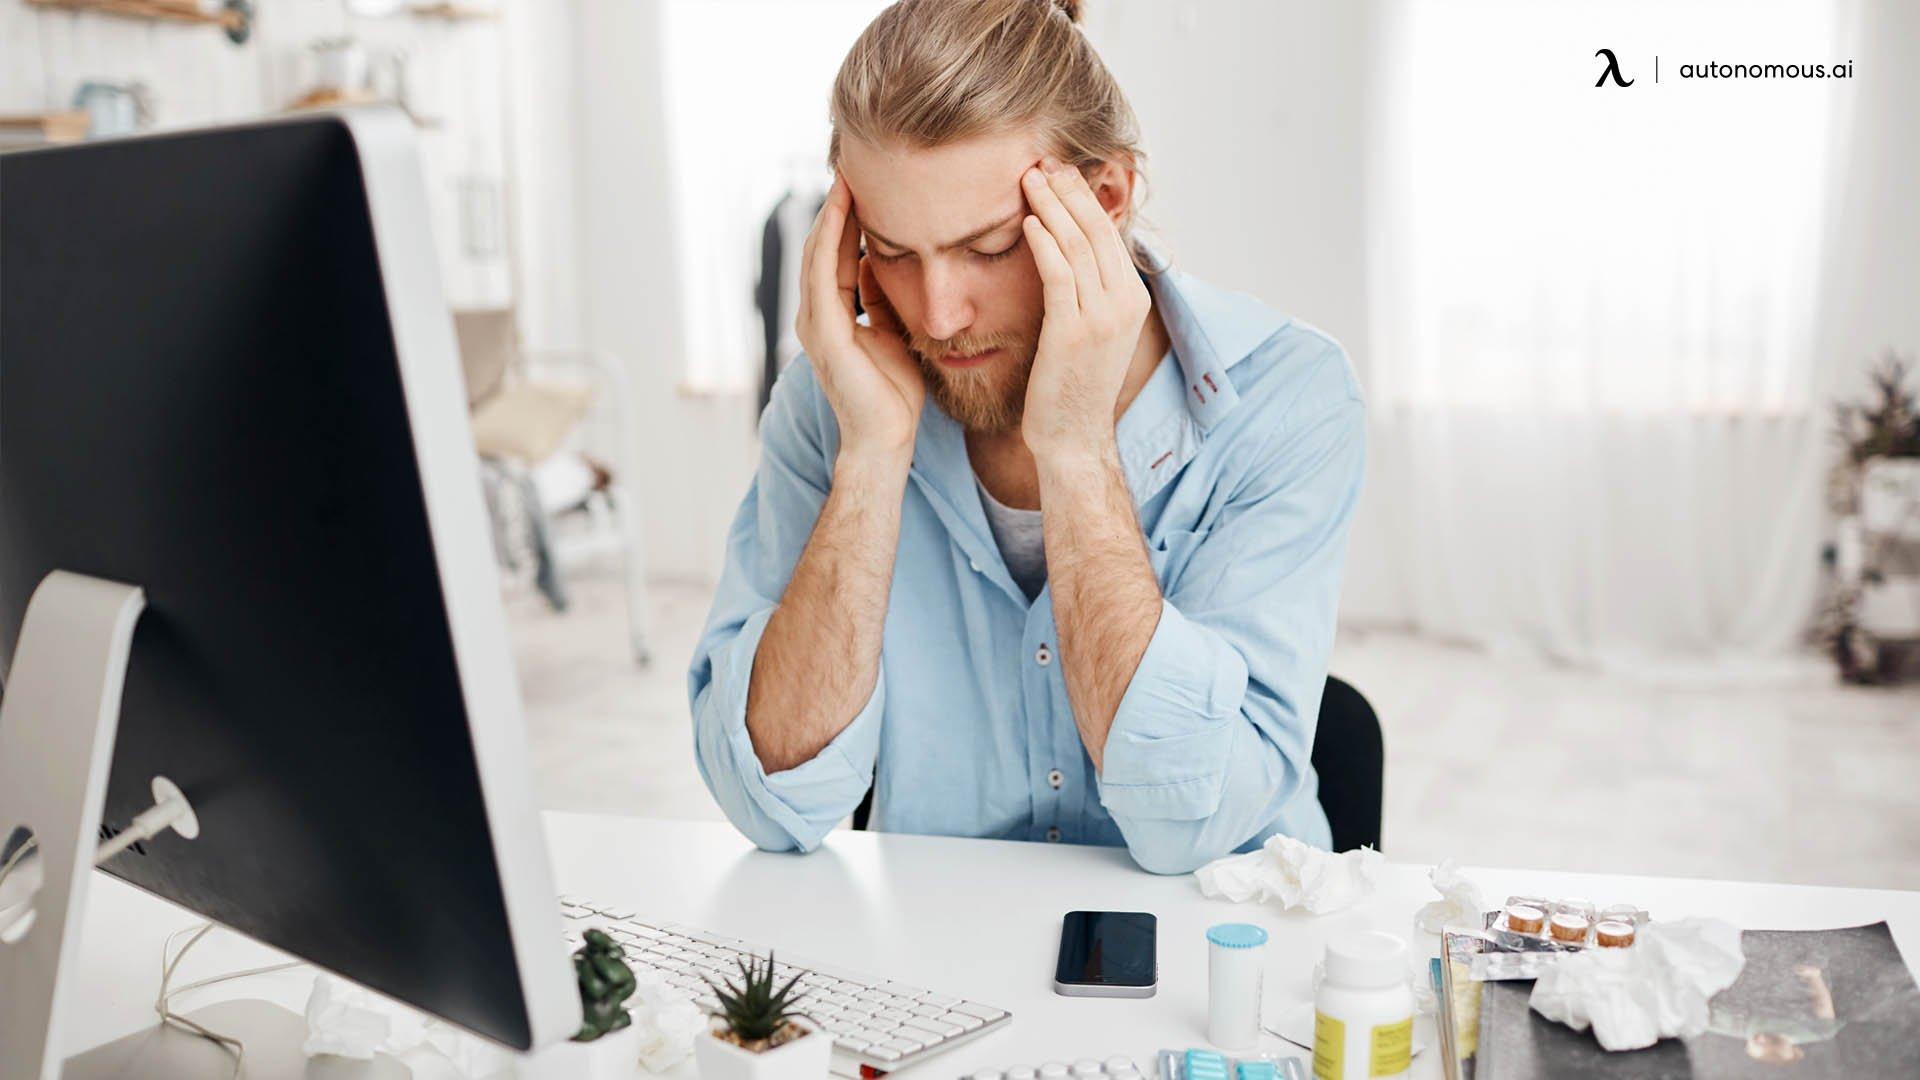 Why Do You Need a Workstation Ergonomic Evaluation?